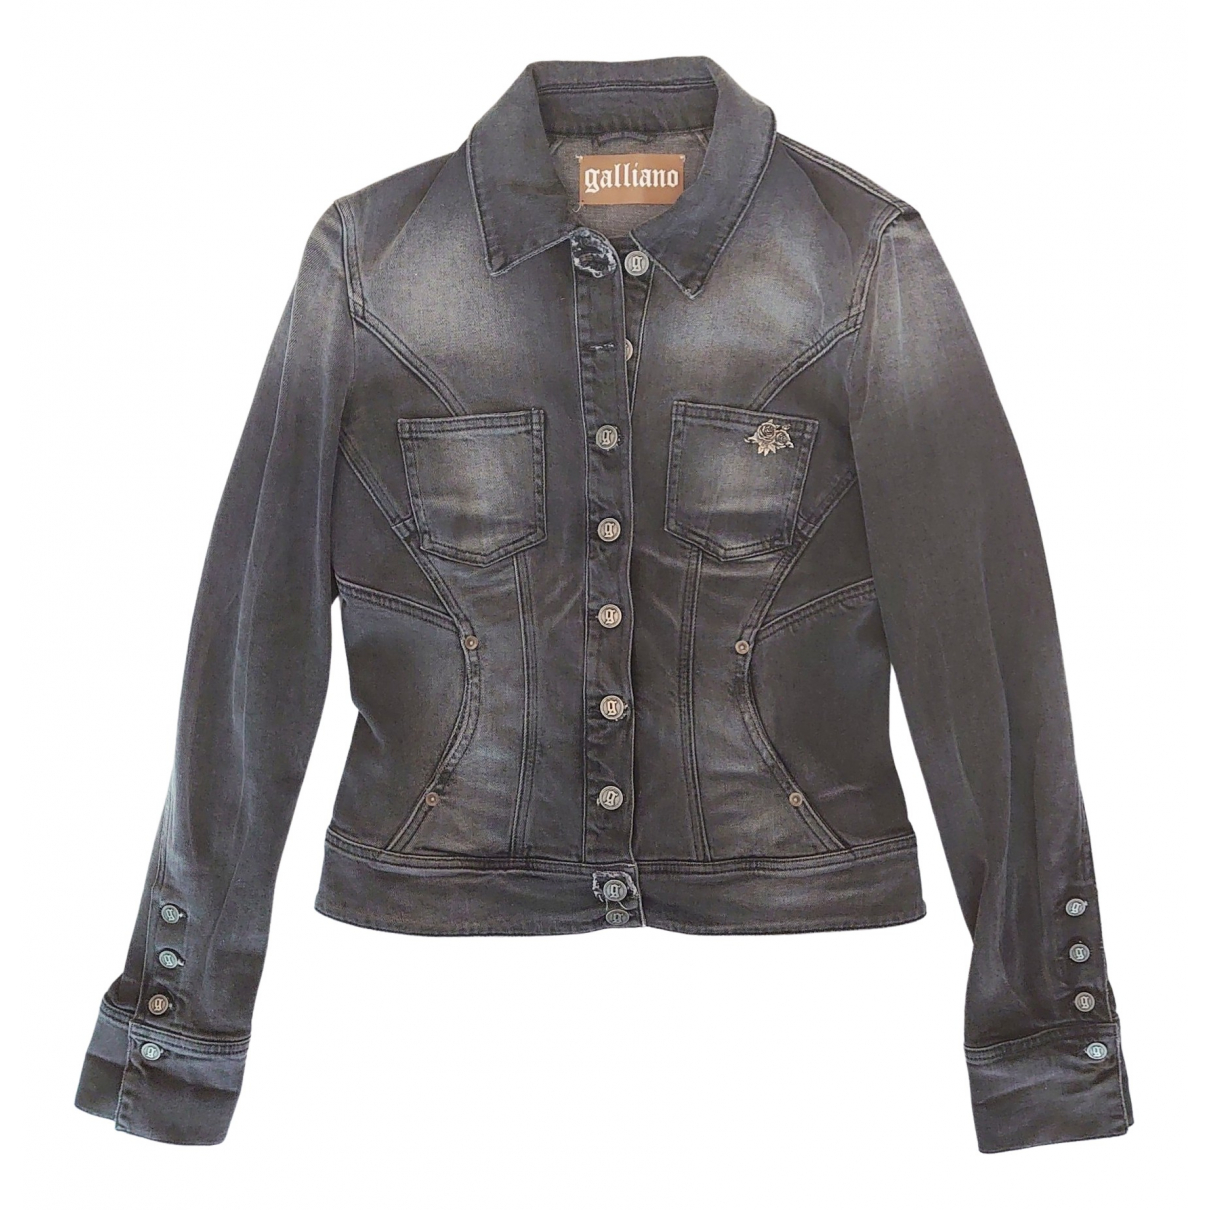 Galliano \N Grey Cotton jacket for Women 44 IT